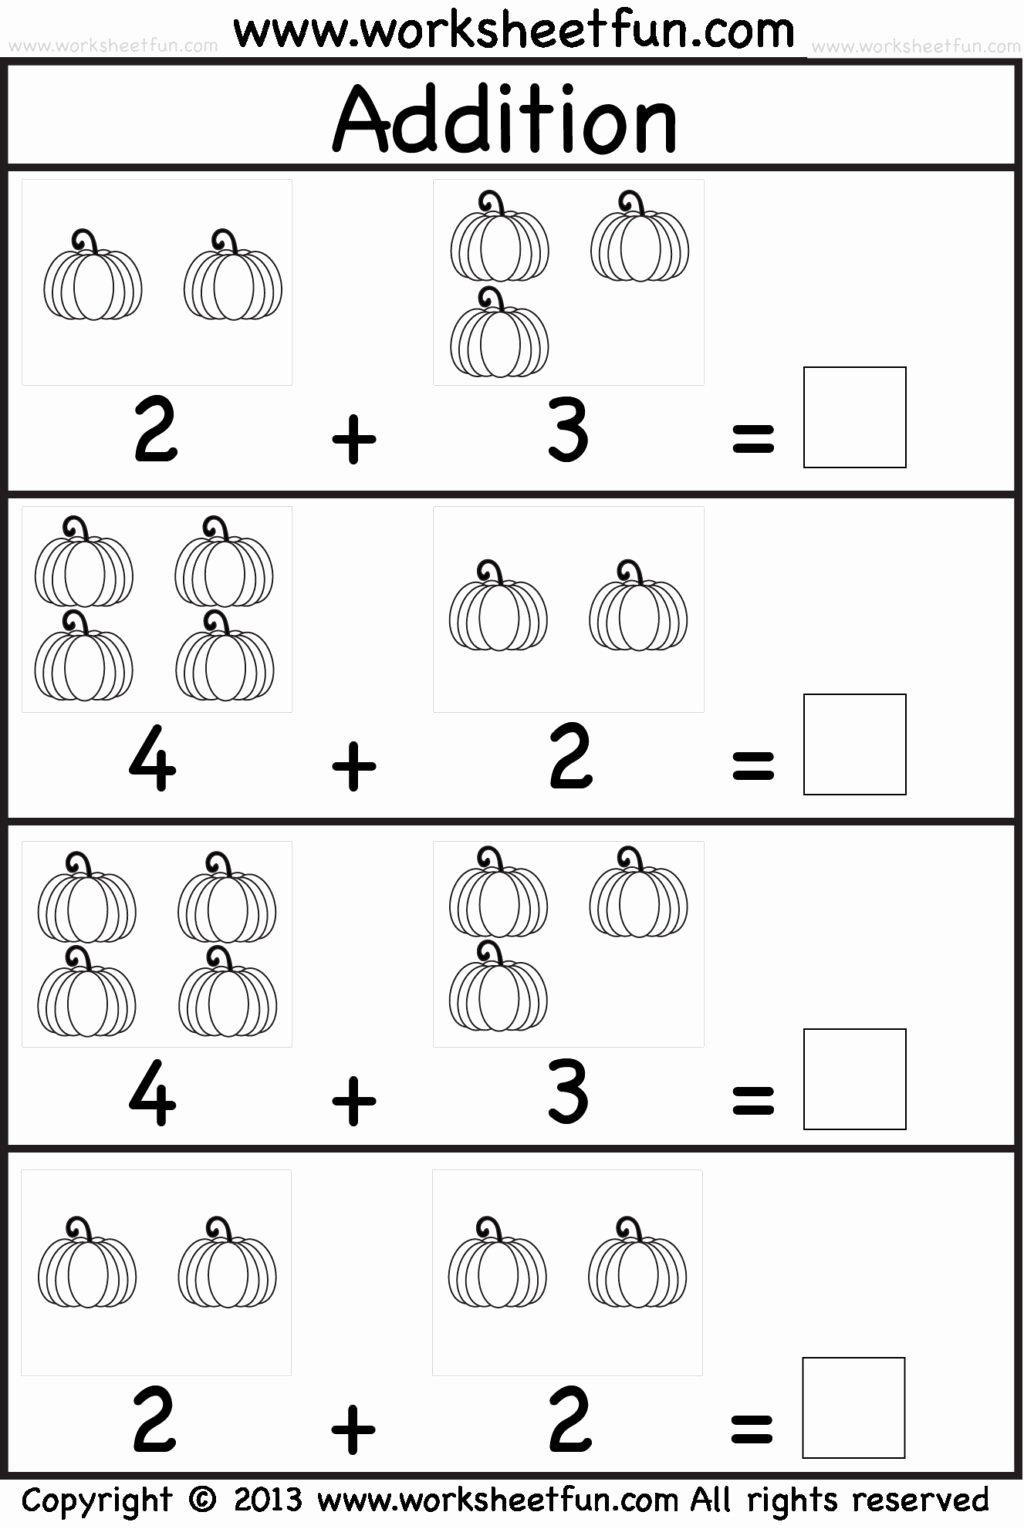 Free Printables Math Worksheets for Preschoolers Best Of Worksheet Kindergarten Mathrksheets Free Printable Sheets